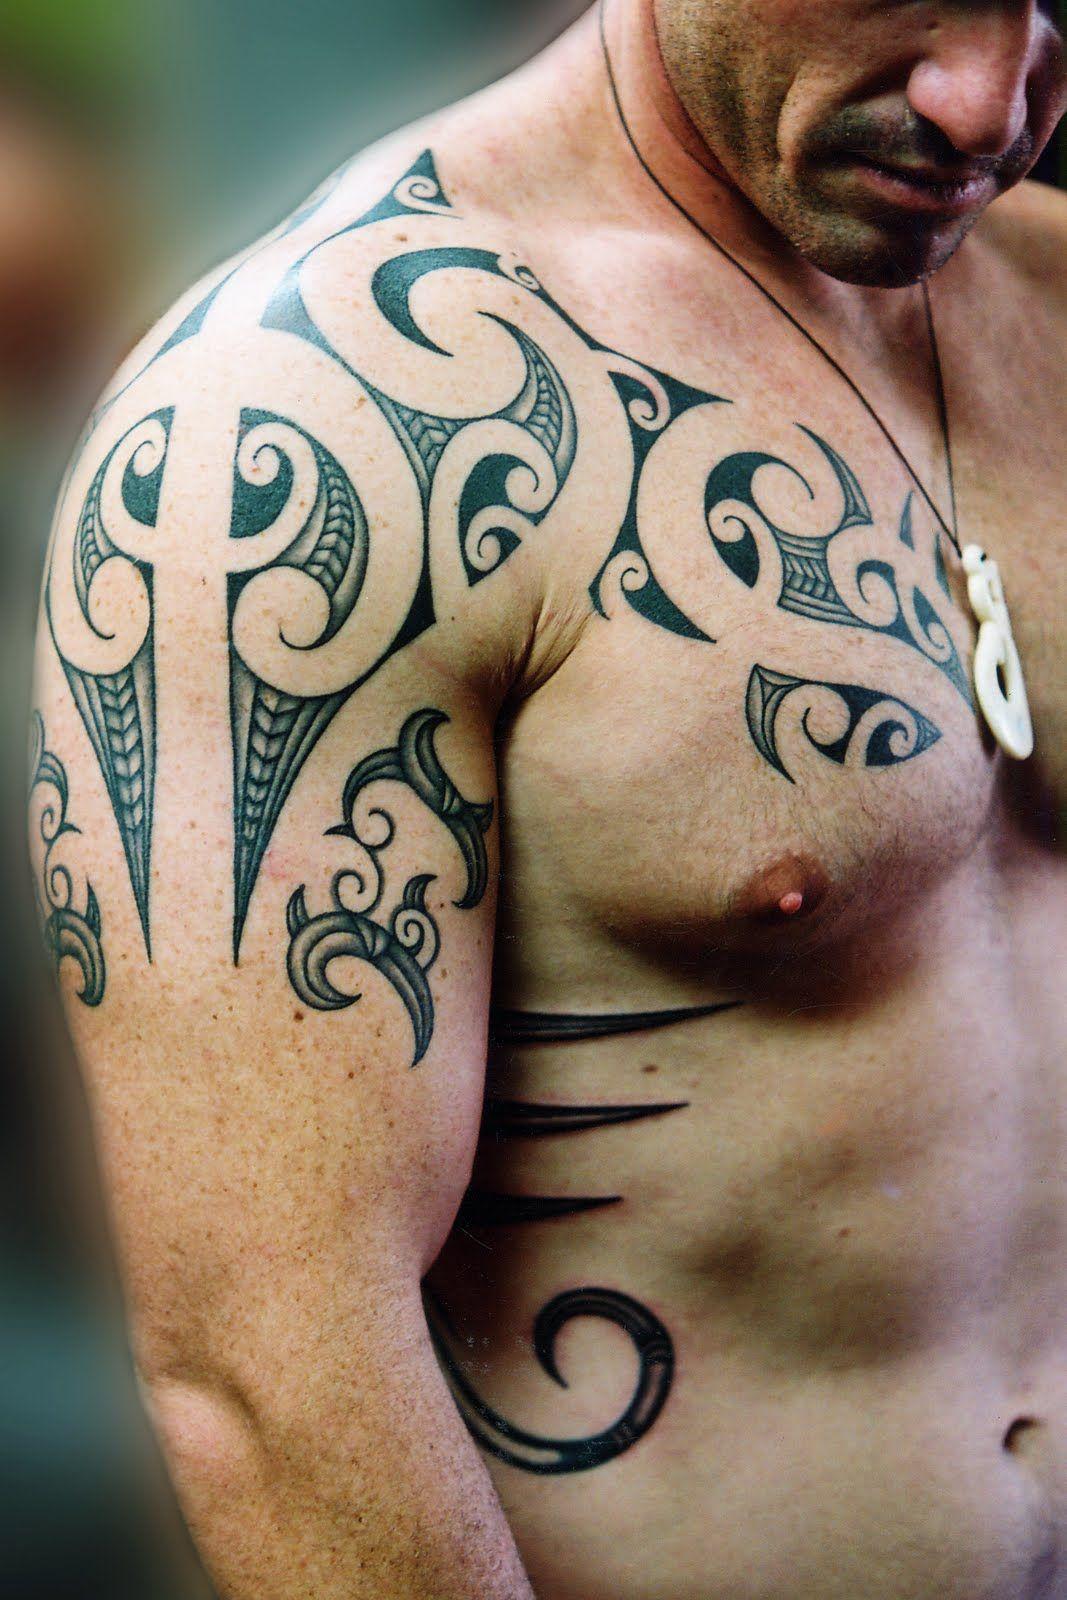 Tattoo for men women find sexy